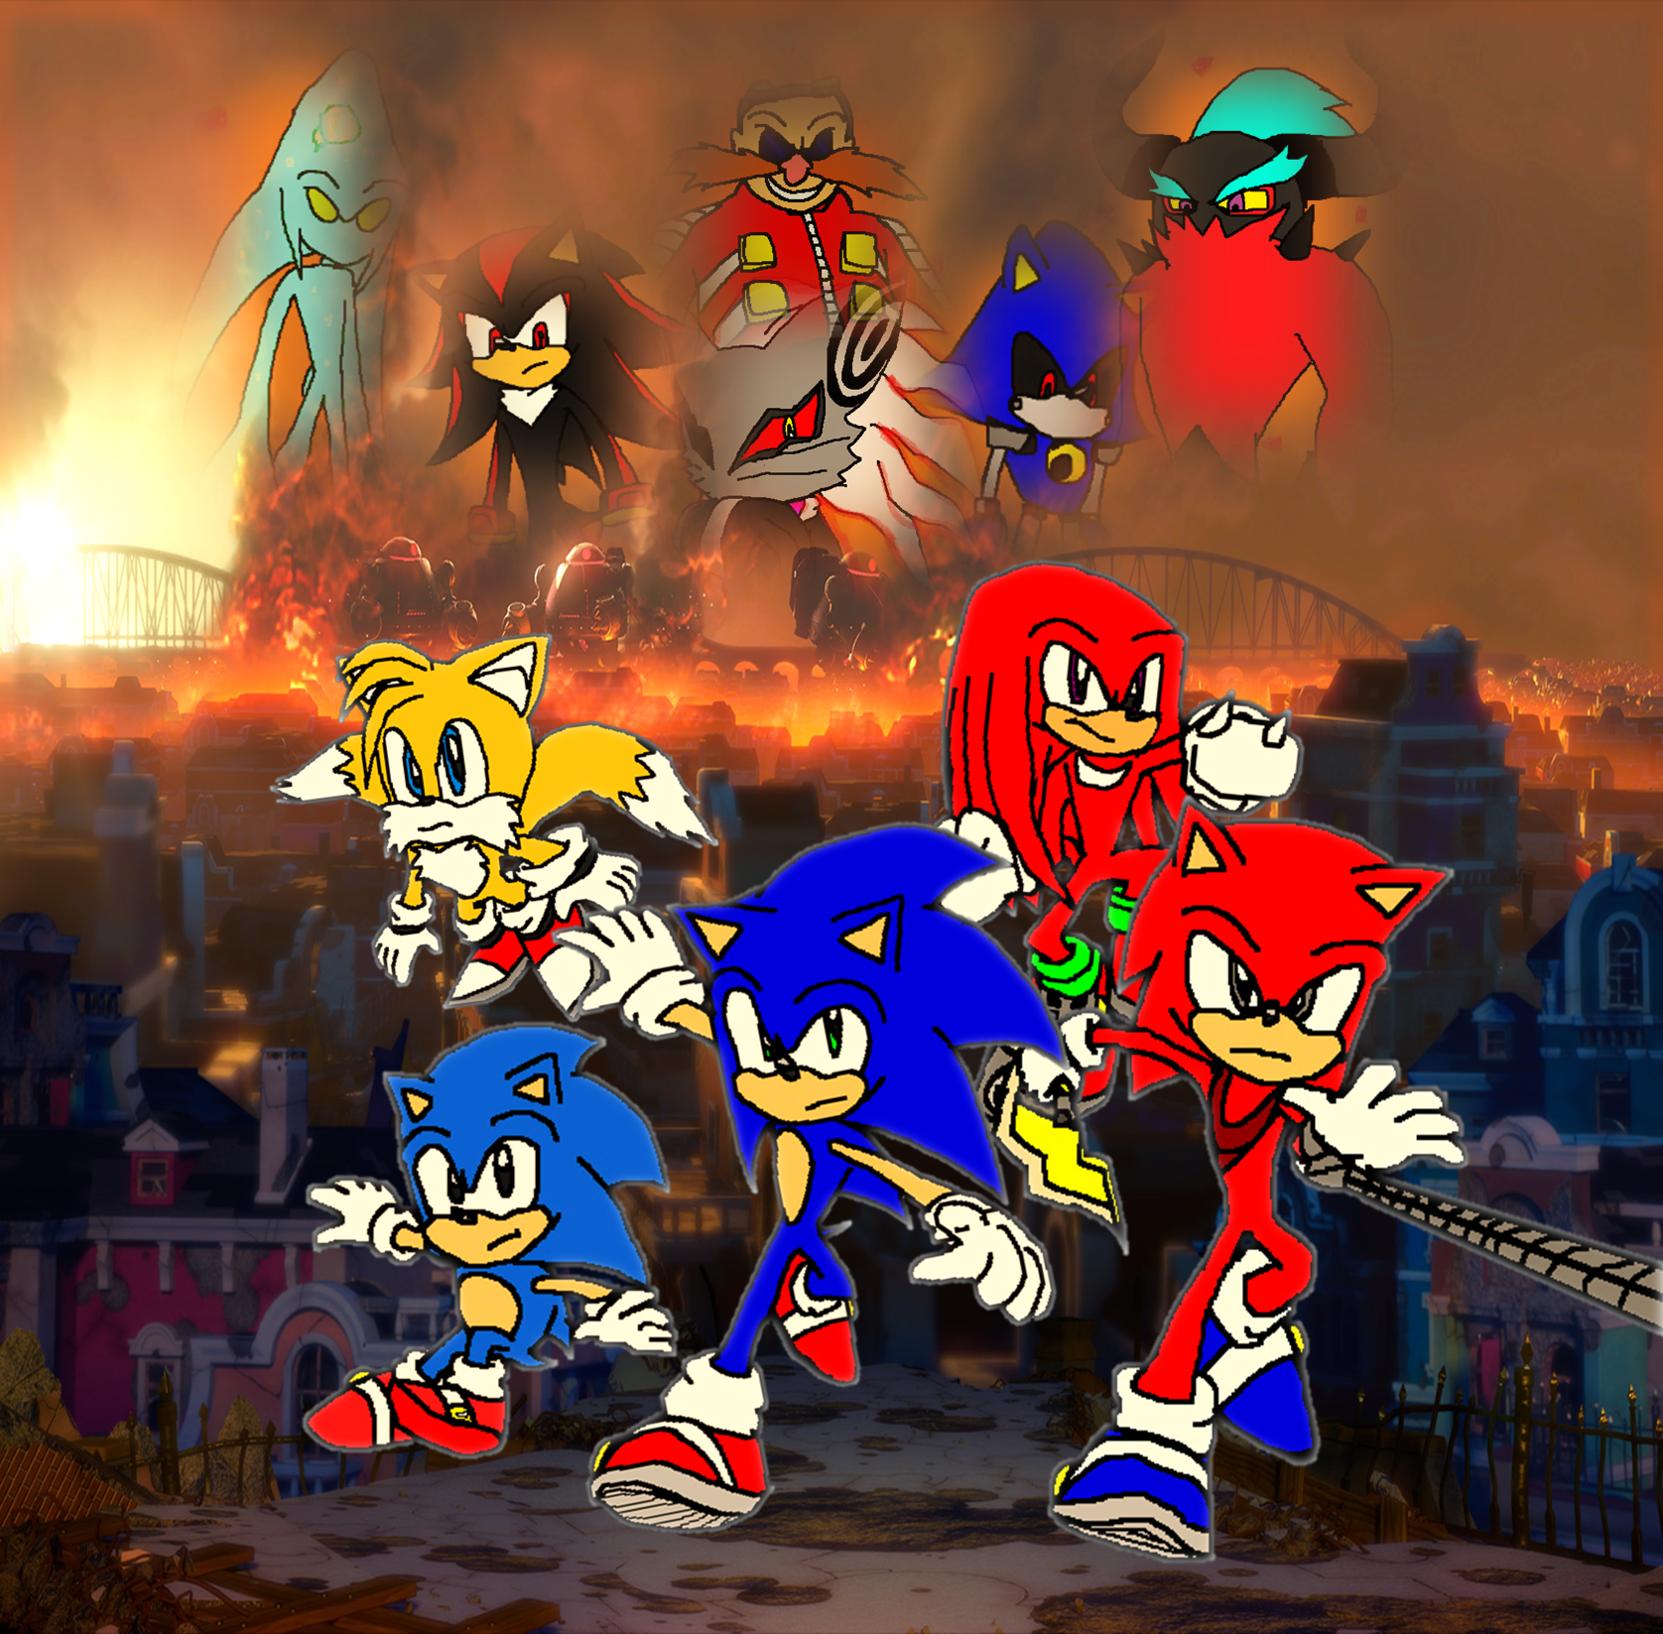 Sonic Forces Resistance Vs Eggman Empire By 9029561 On Deviantart